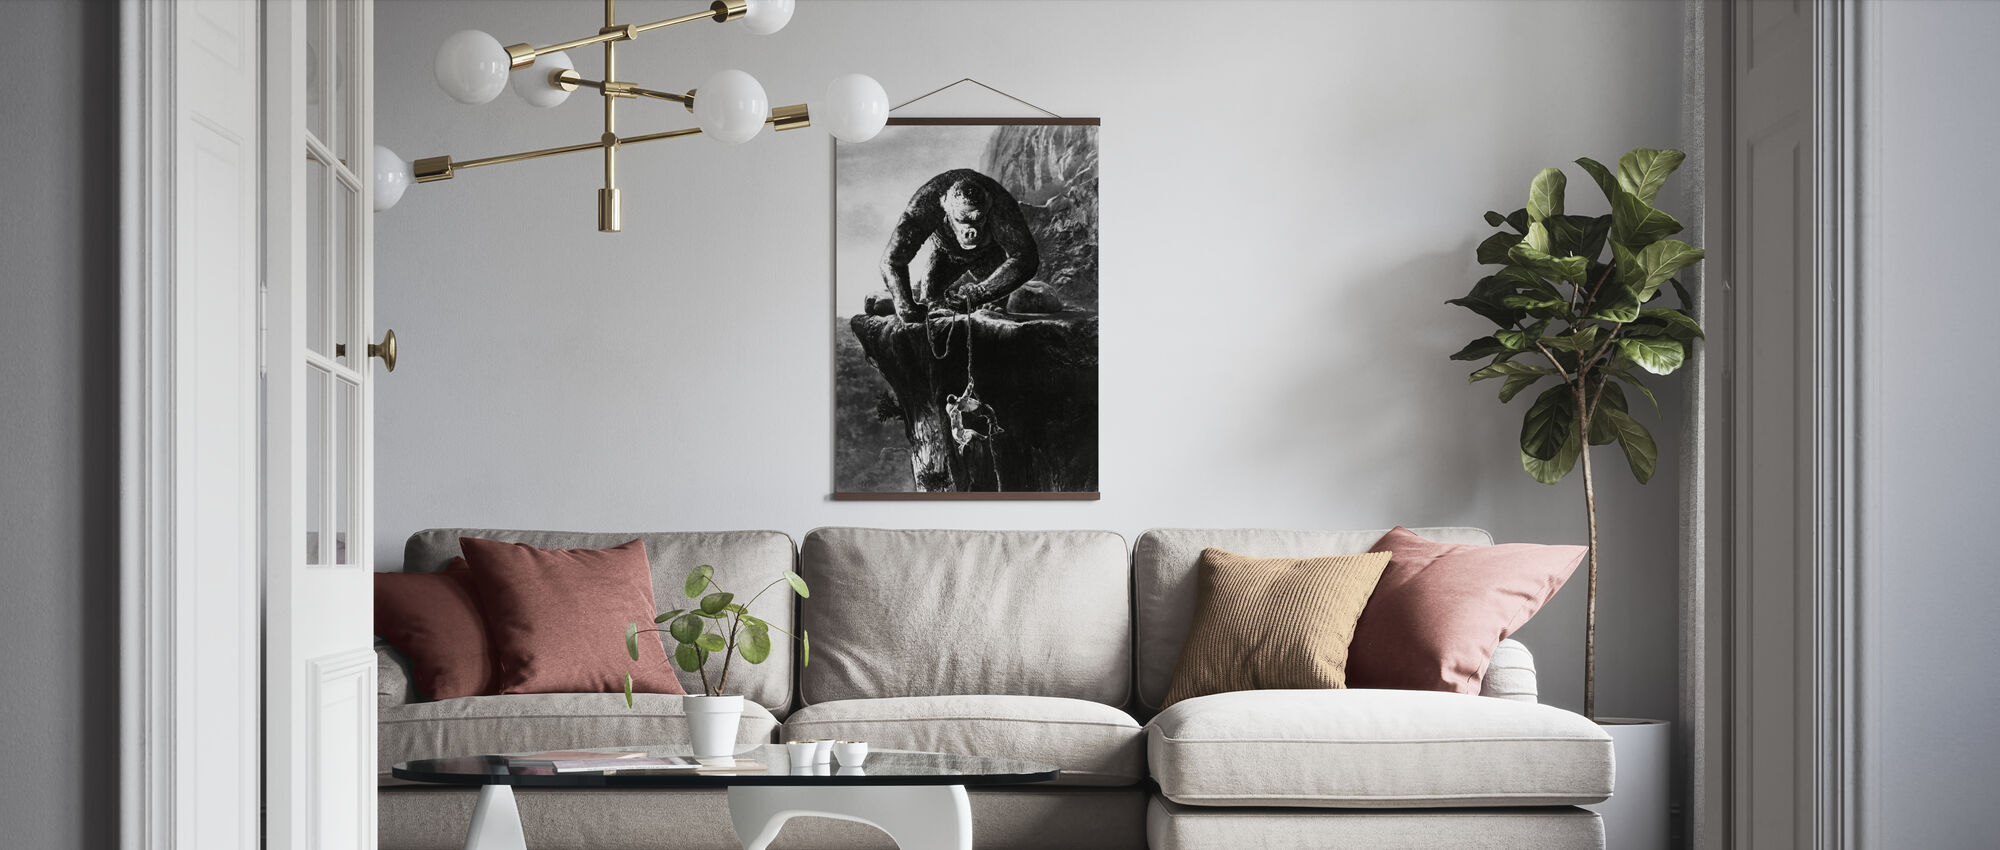 King Kong - Fay Wray - Poster - Living Room